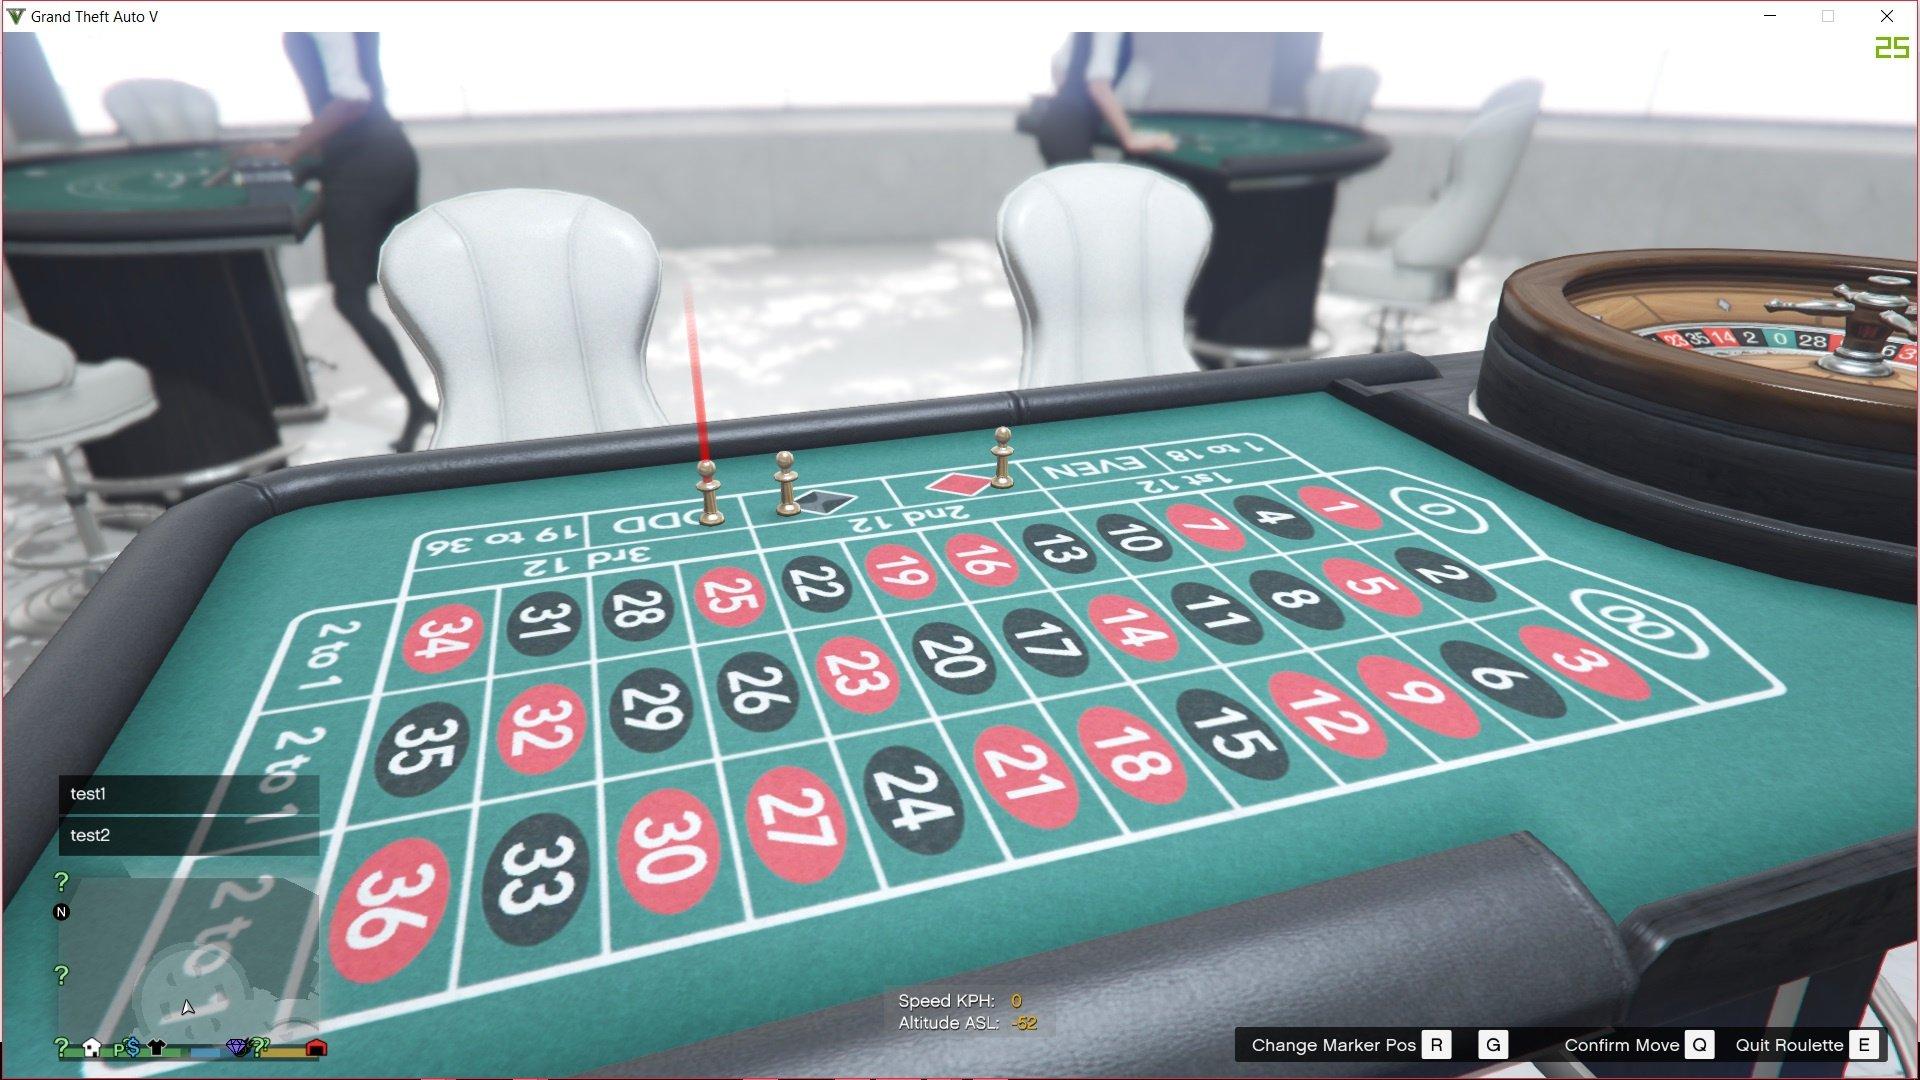 Gts Portugal fóruns casino 268472